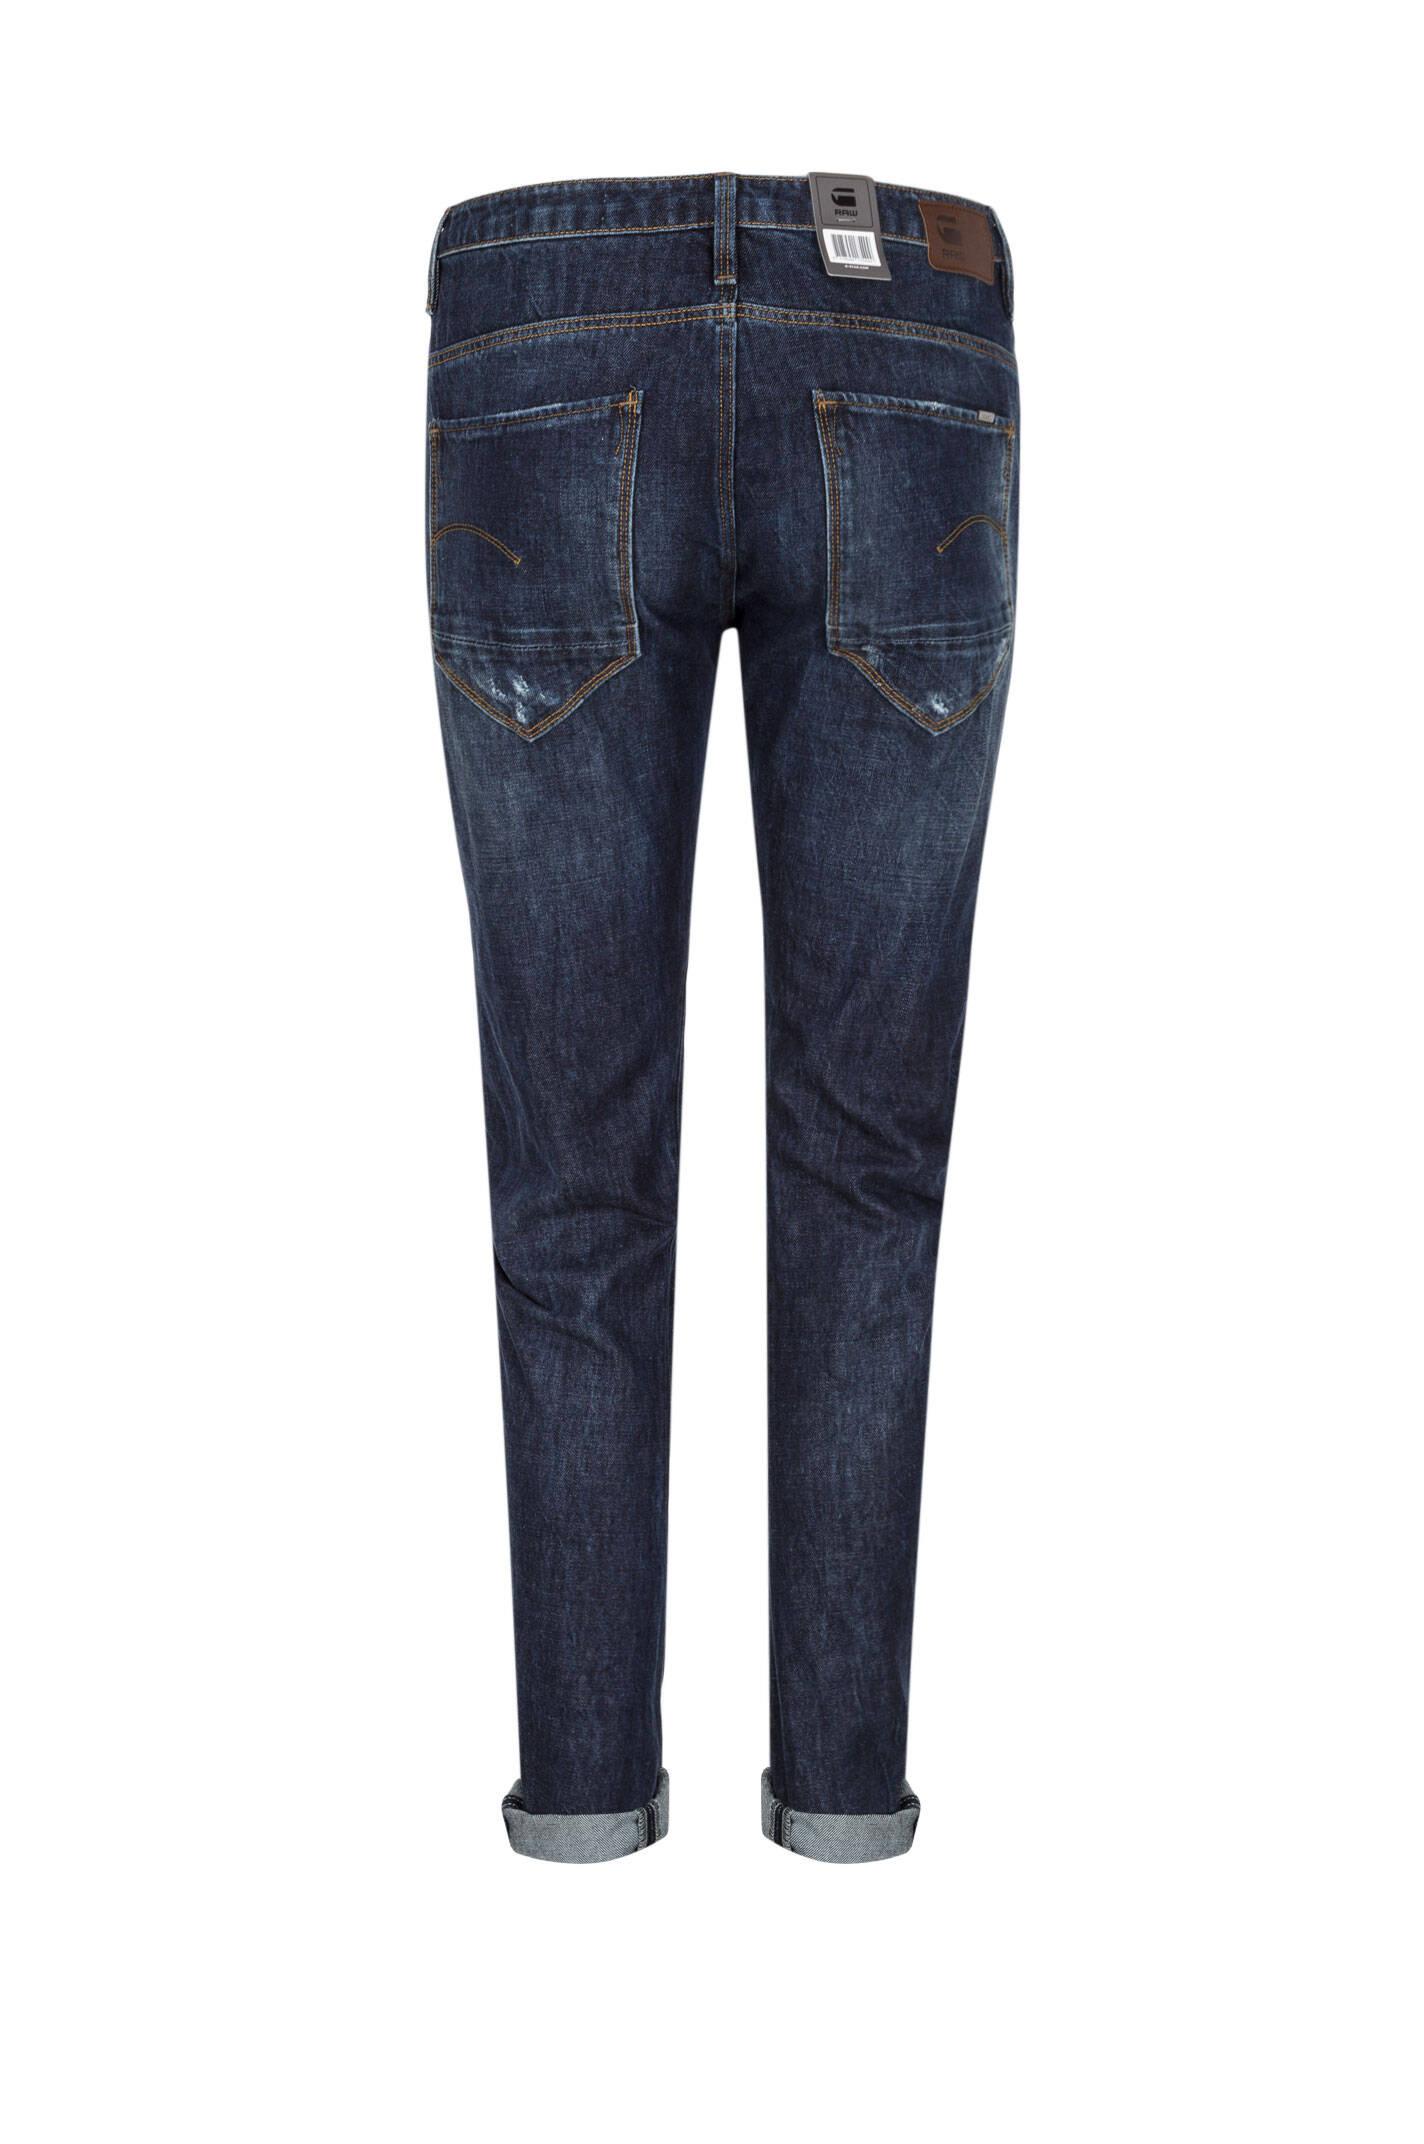 boyfriendy arc 3d g star raw granatowy jeansy spodnie. Black Bedroom Furniture Sets. Home Design Ideas